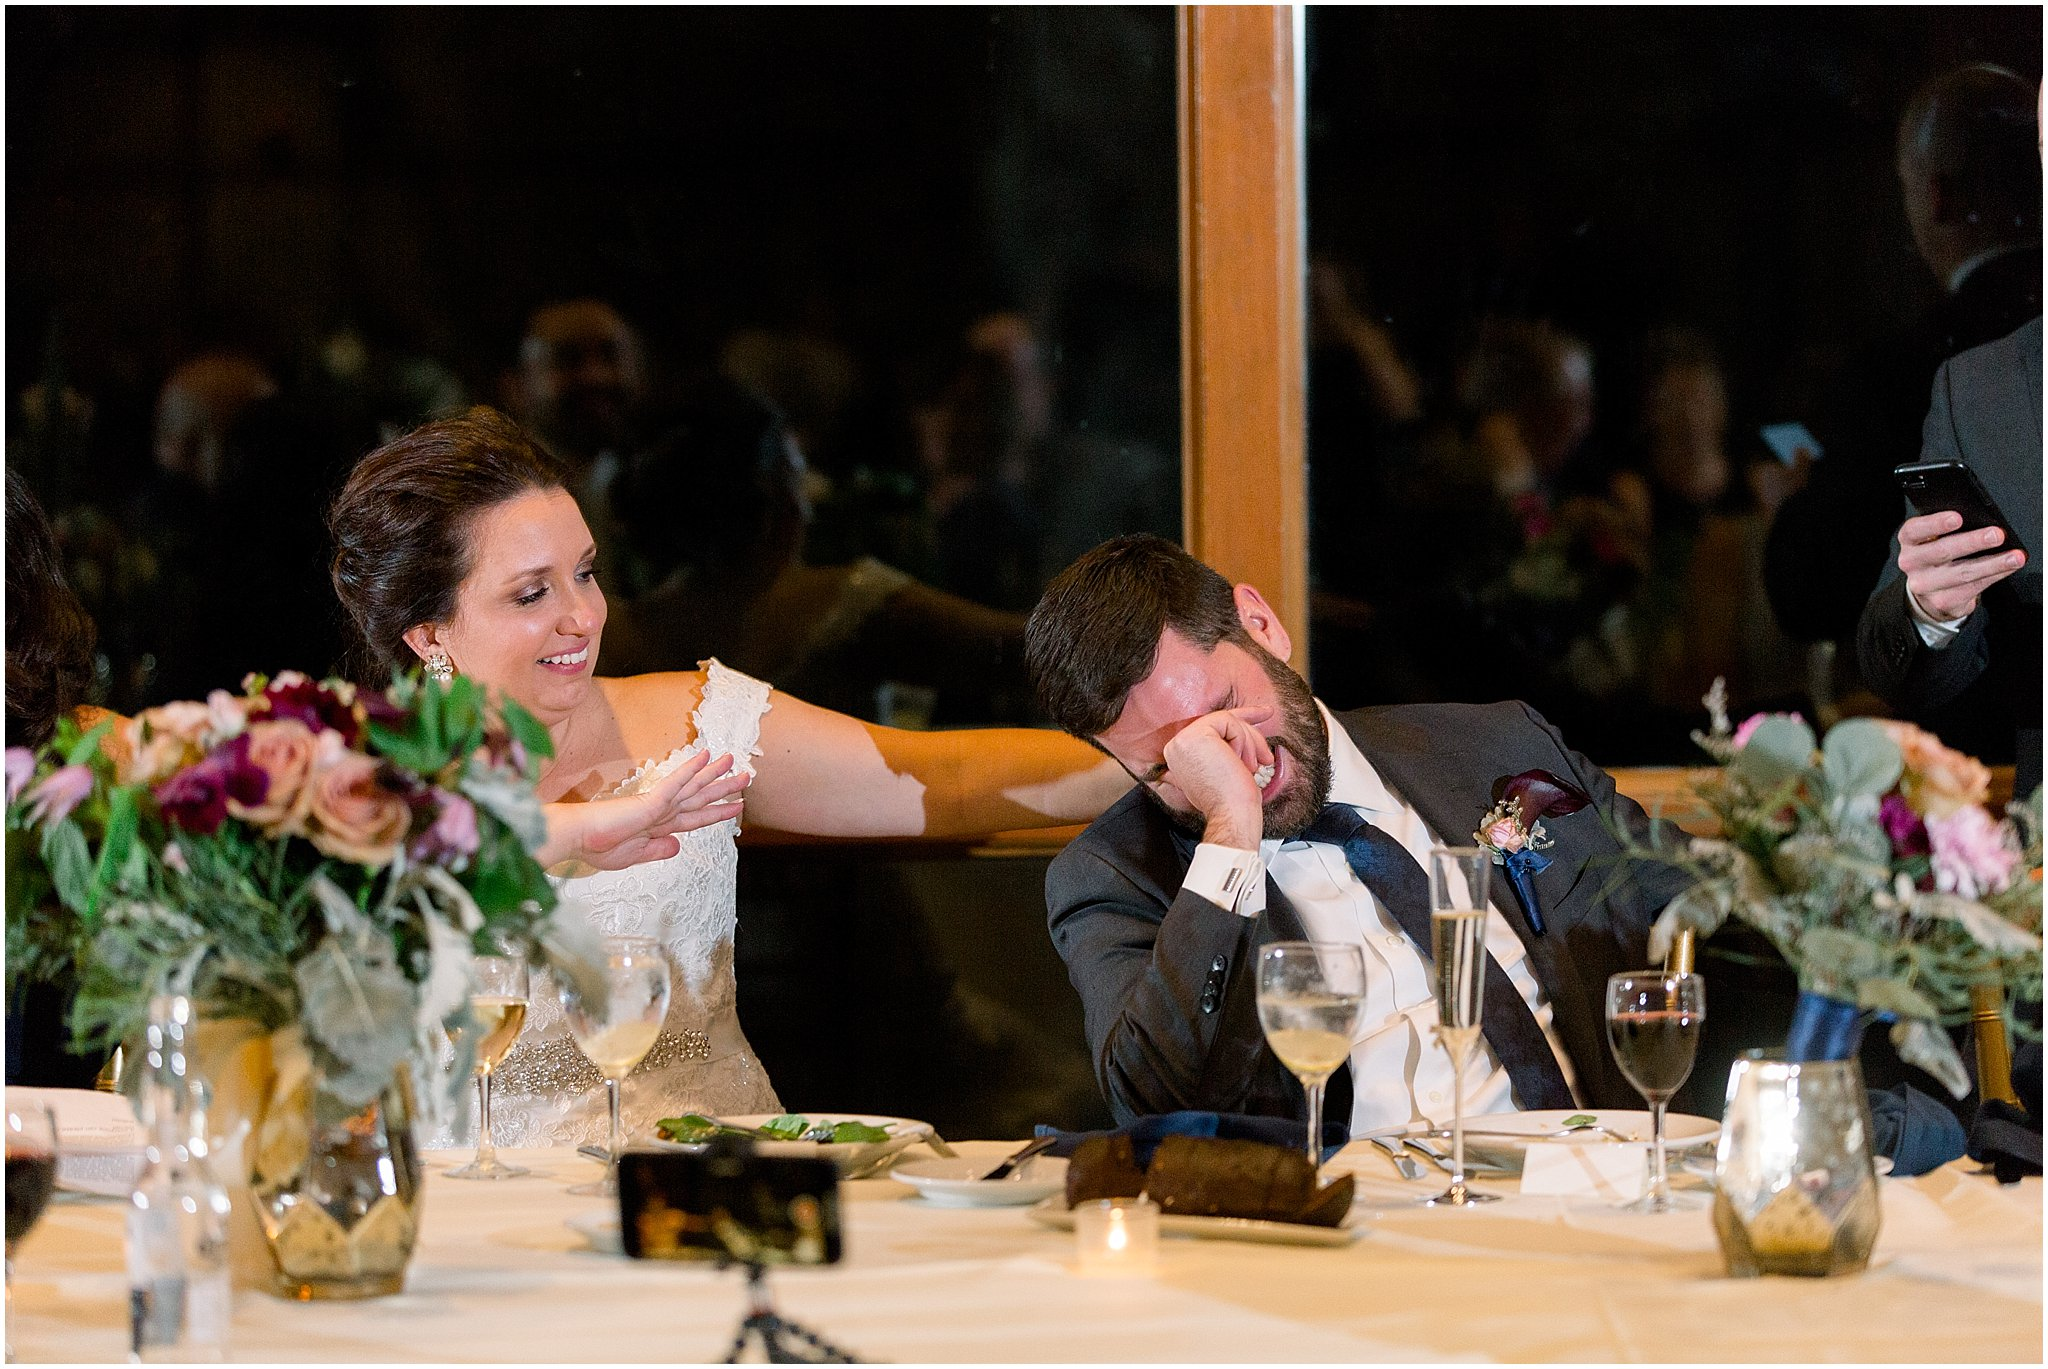 Hyatt-Lodge-Mcdonald-Campus-Wedding_0066.jpg